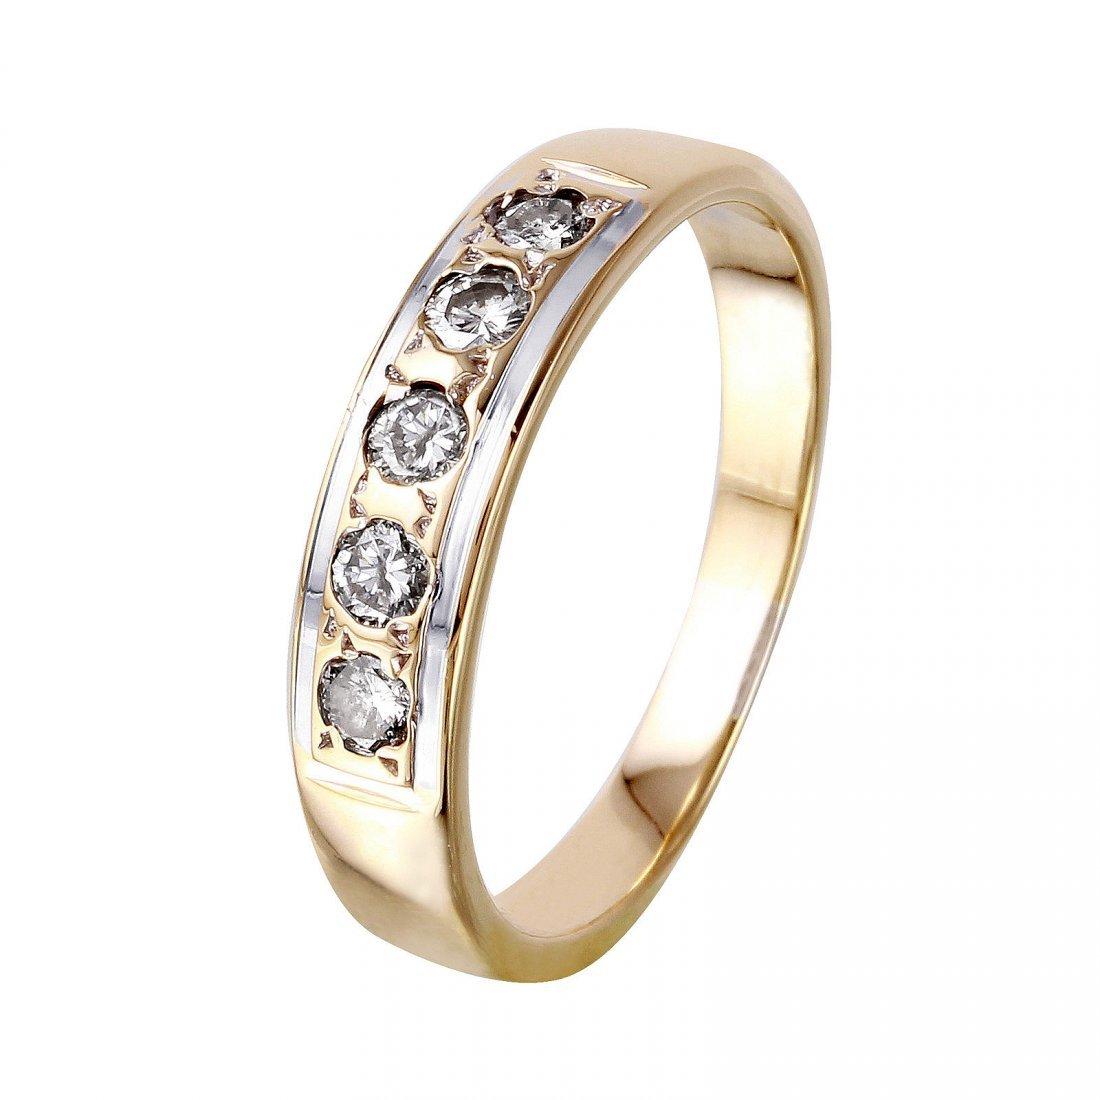 14K Yellow Gold Diamond Wedding Band, 0.3 ctw